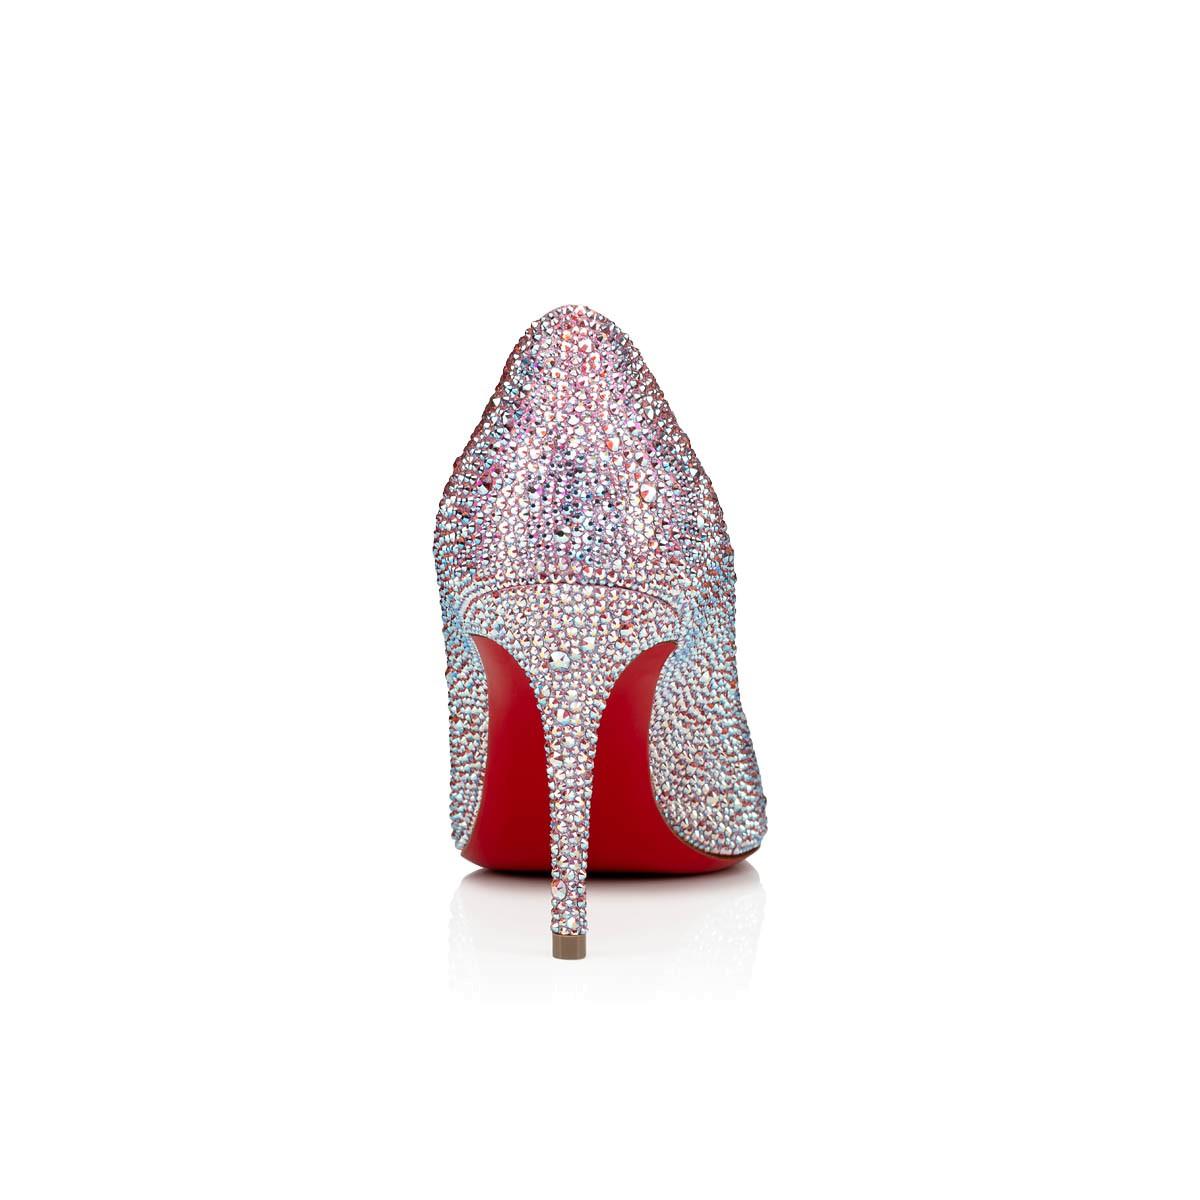 鞋履 - Kate Strass 085 Strass - Christian Louboutin